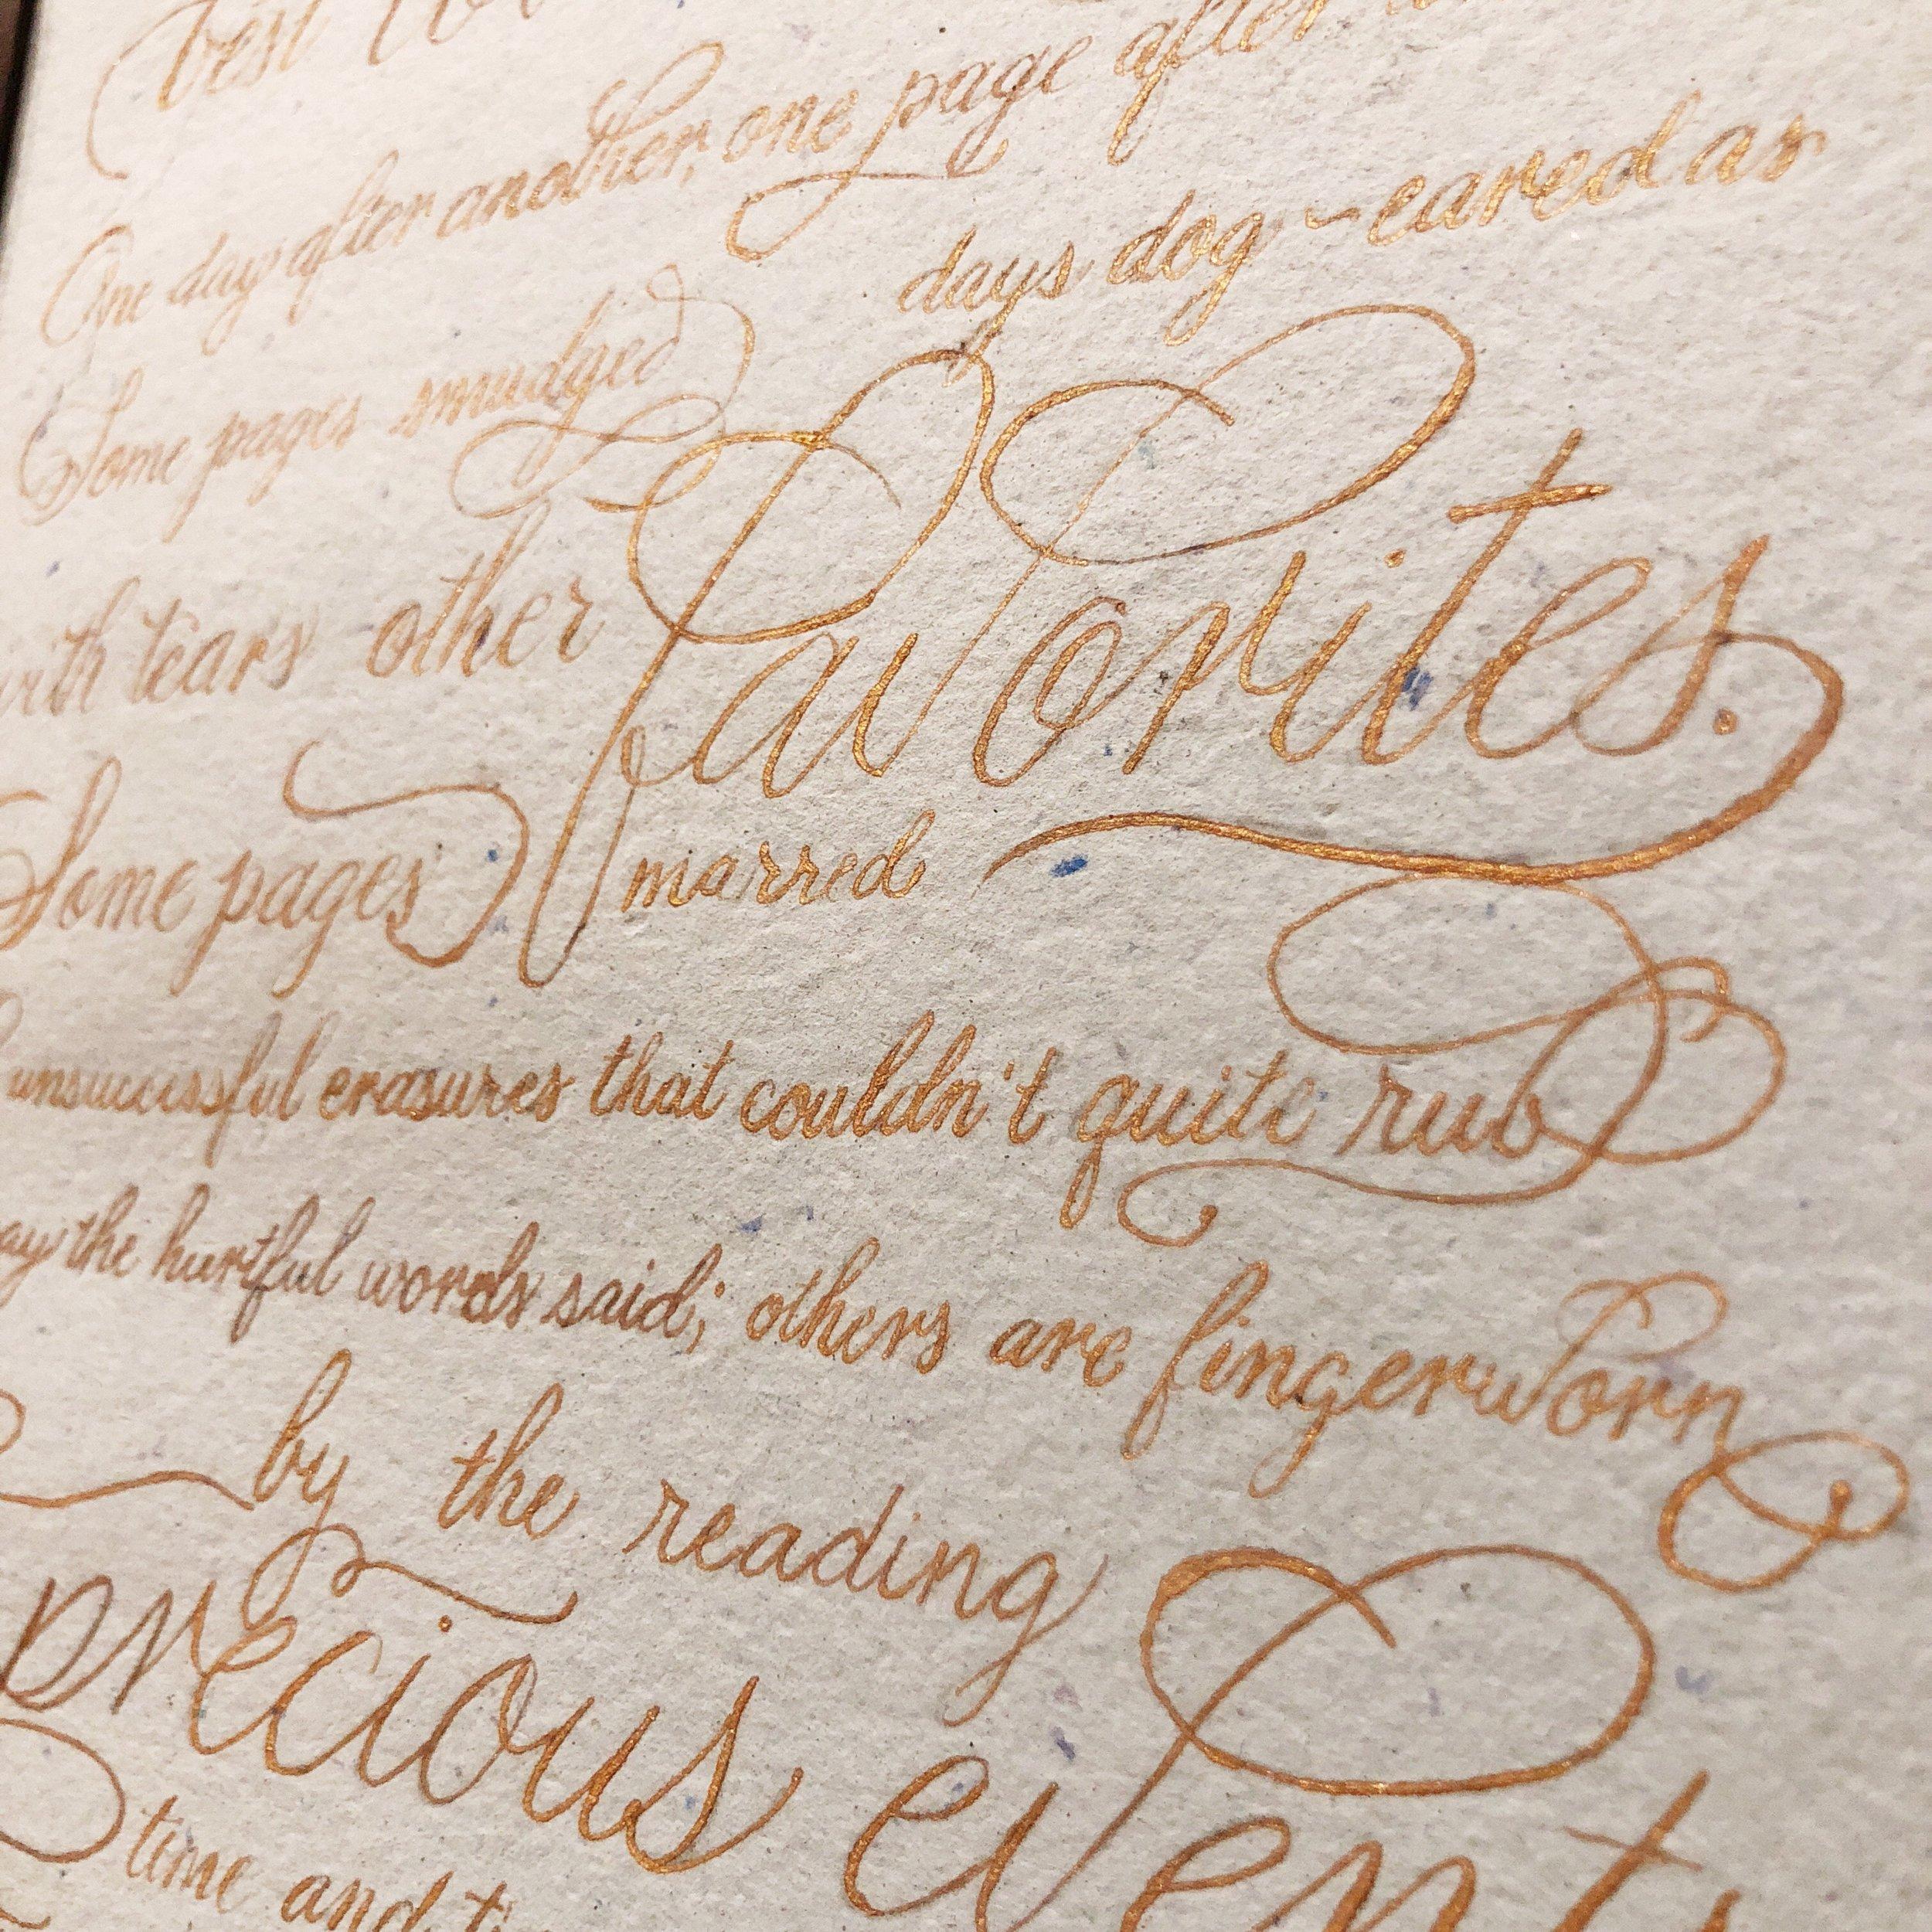 Central PA, York PA, JesSmith Designs, custom, wedding, invitations, bridal, announcements, save the date, baby, hanover, calligraphy, baltimore, wedding invitations, lancaster, gettysburg-03-06 06.02.11.jpg